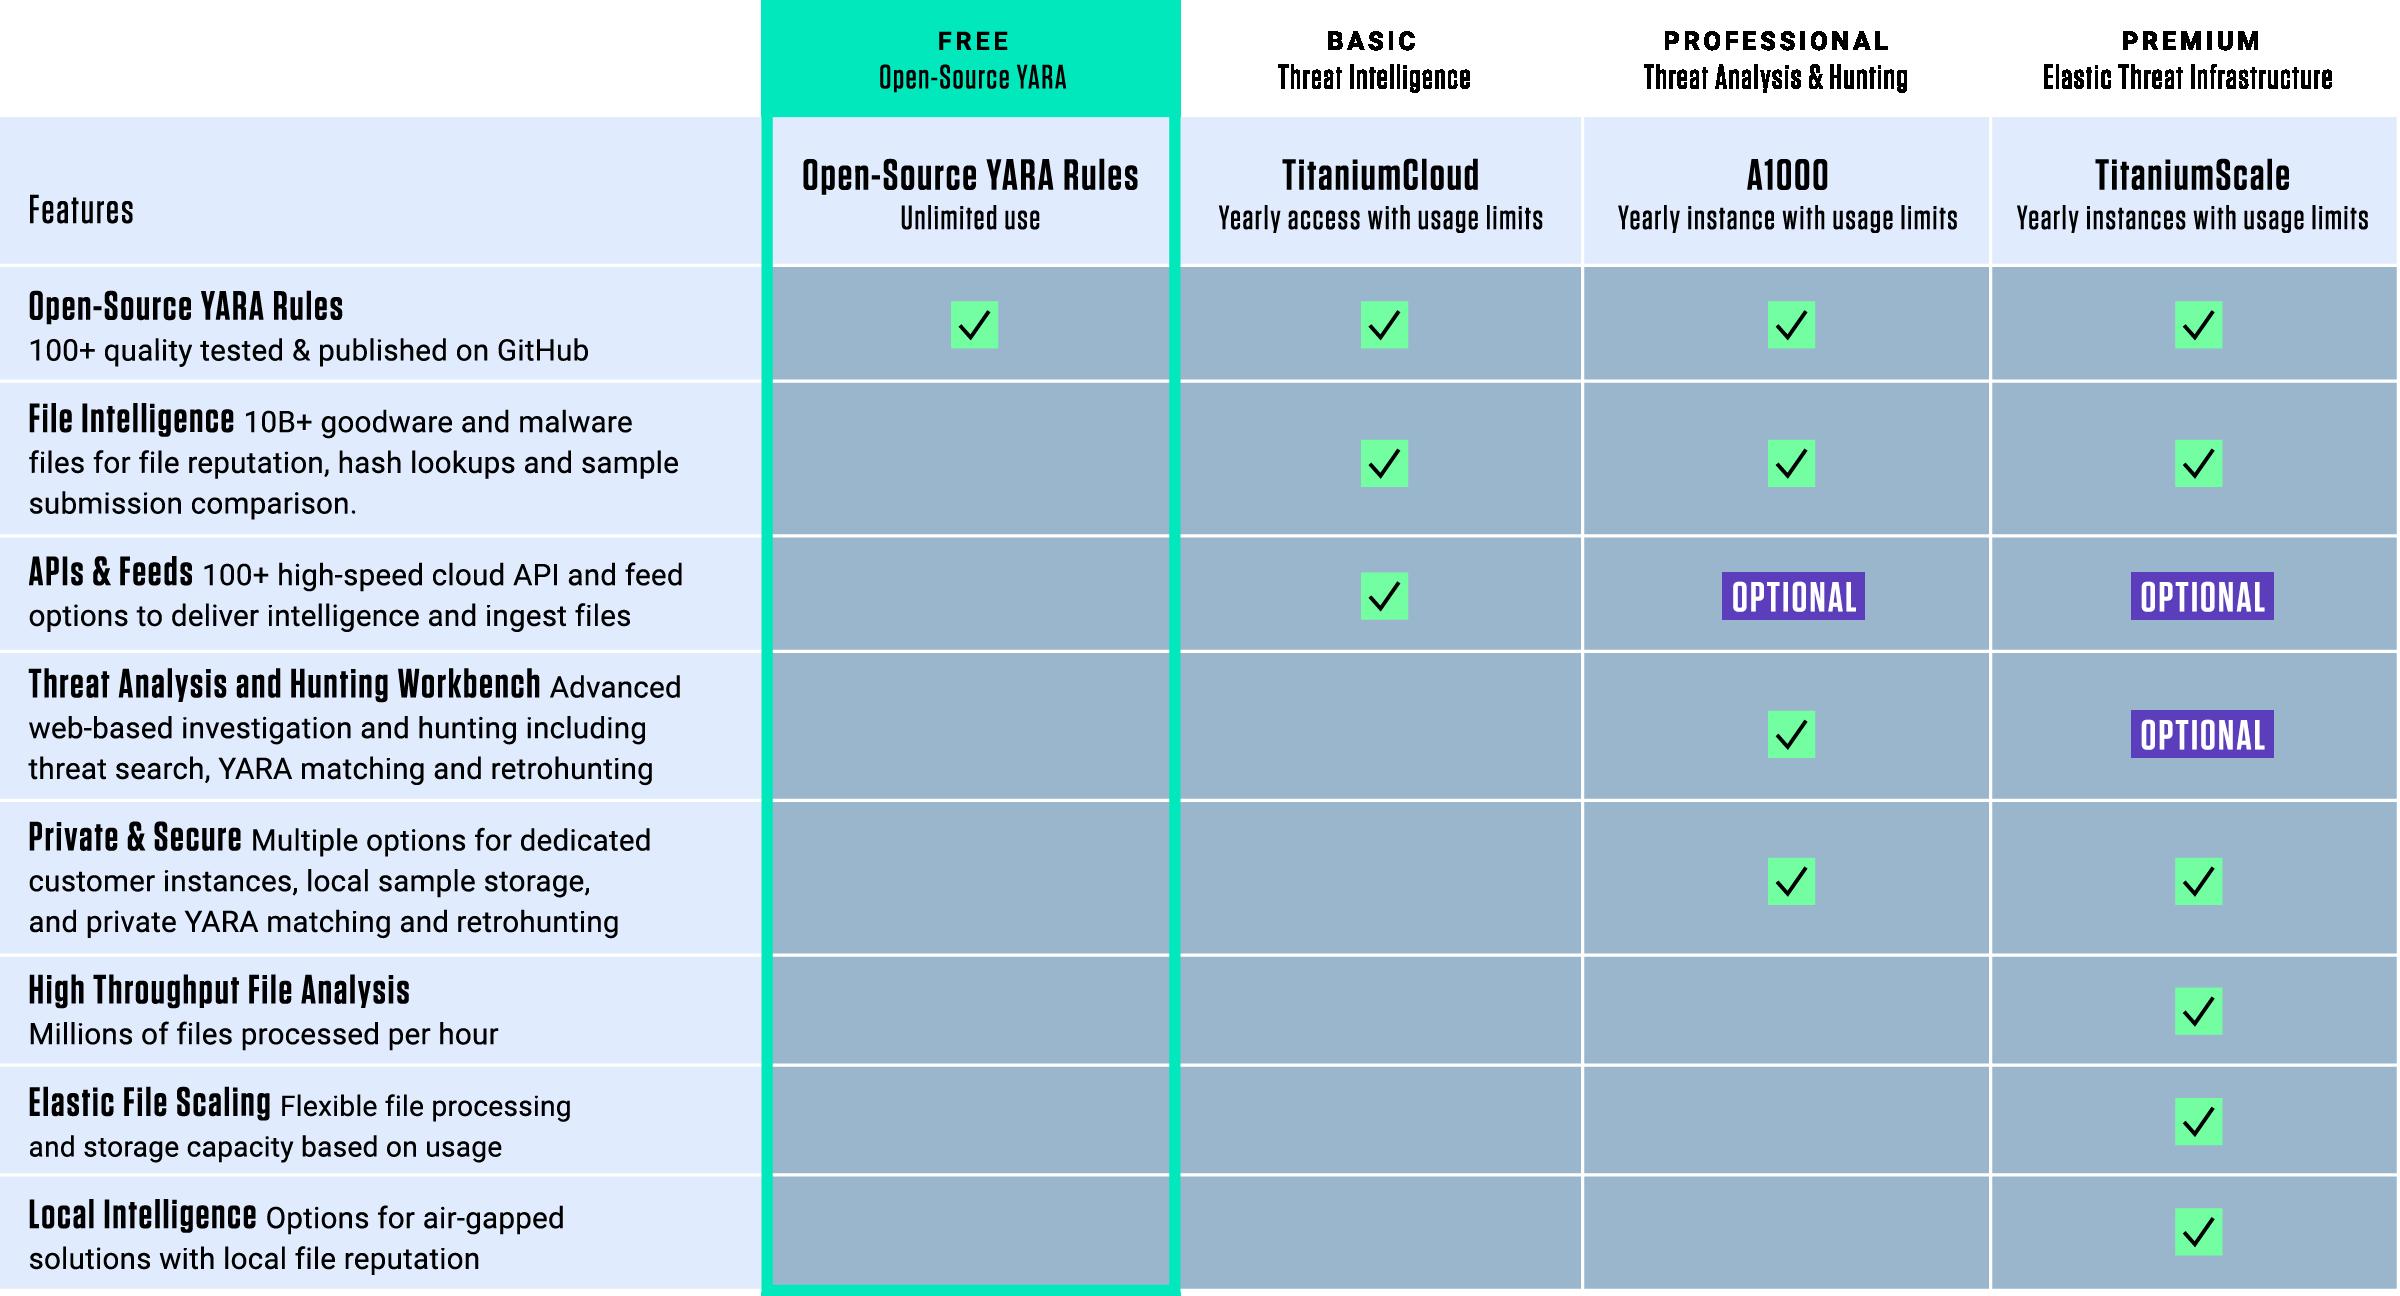 Open-Source YARA Rules